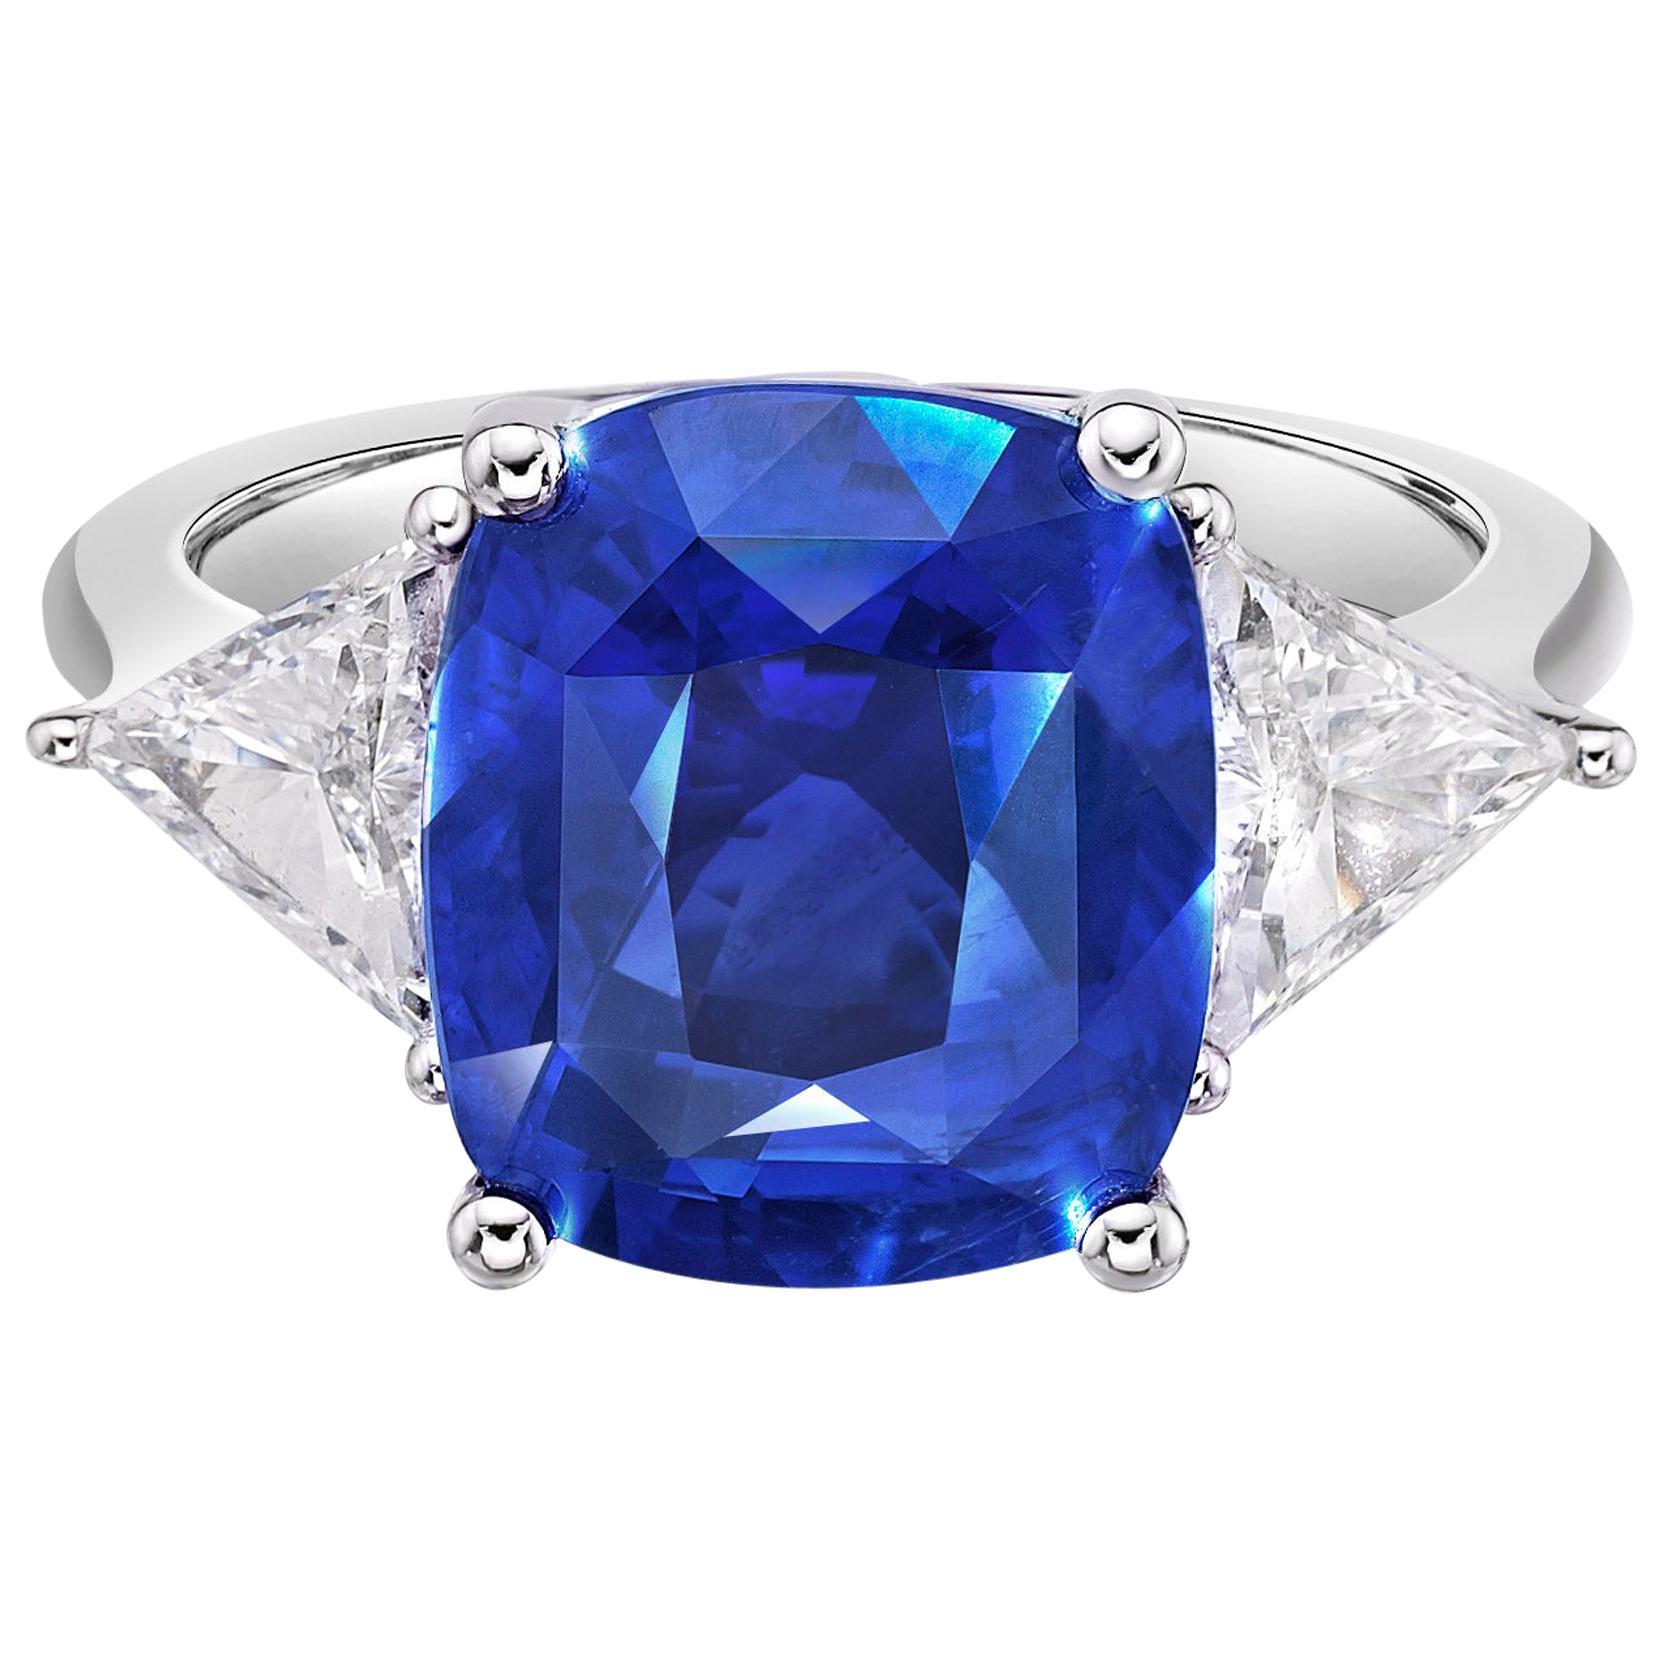 8.03 Carat Royal Blue Sapphire Sri Lanka GRS Certified Unheated Ceylon Ring